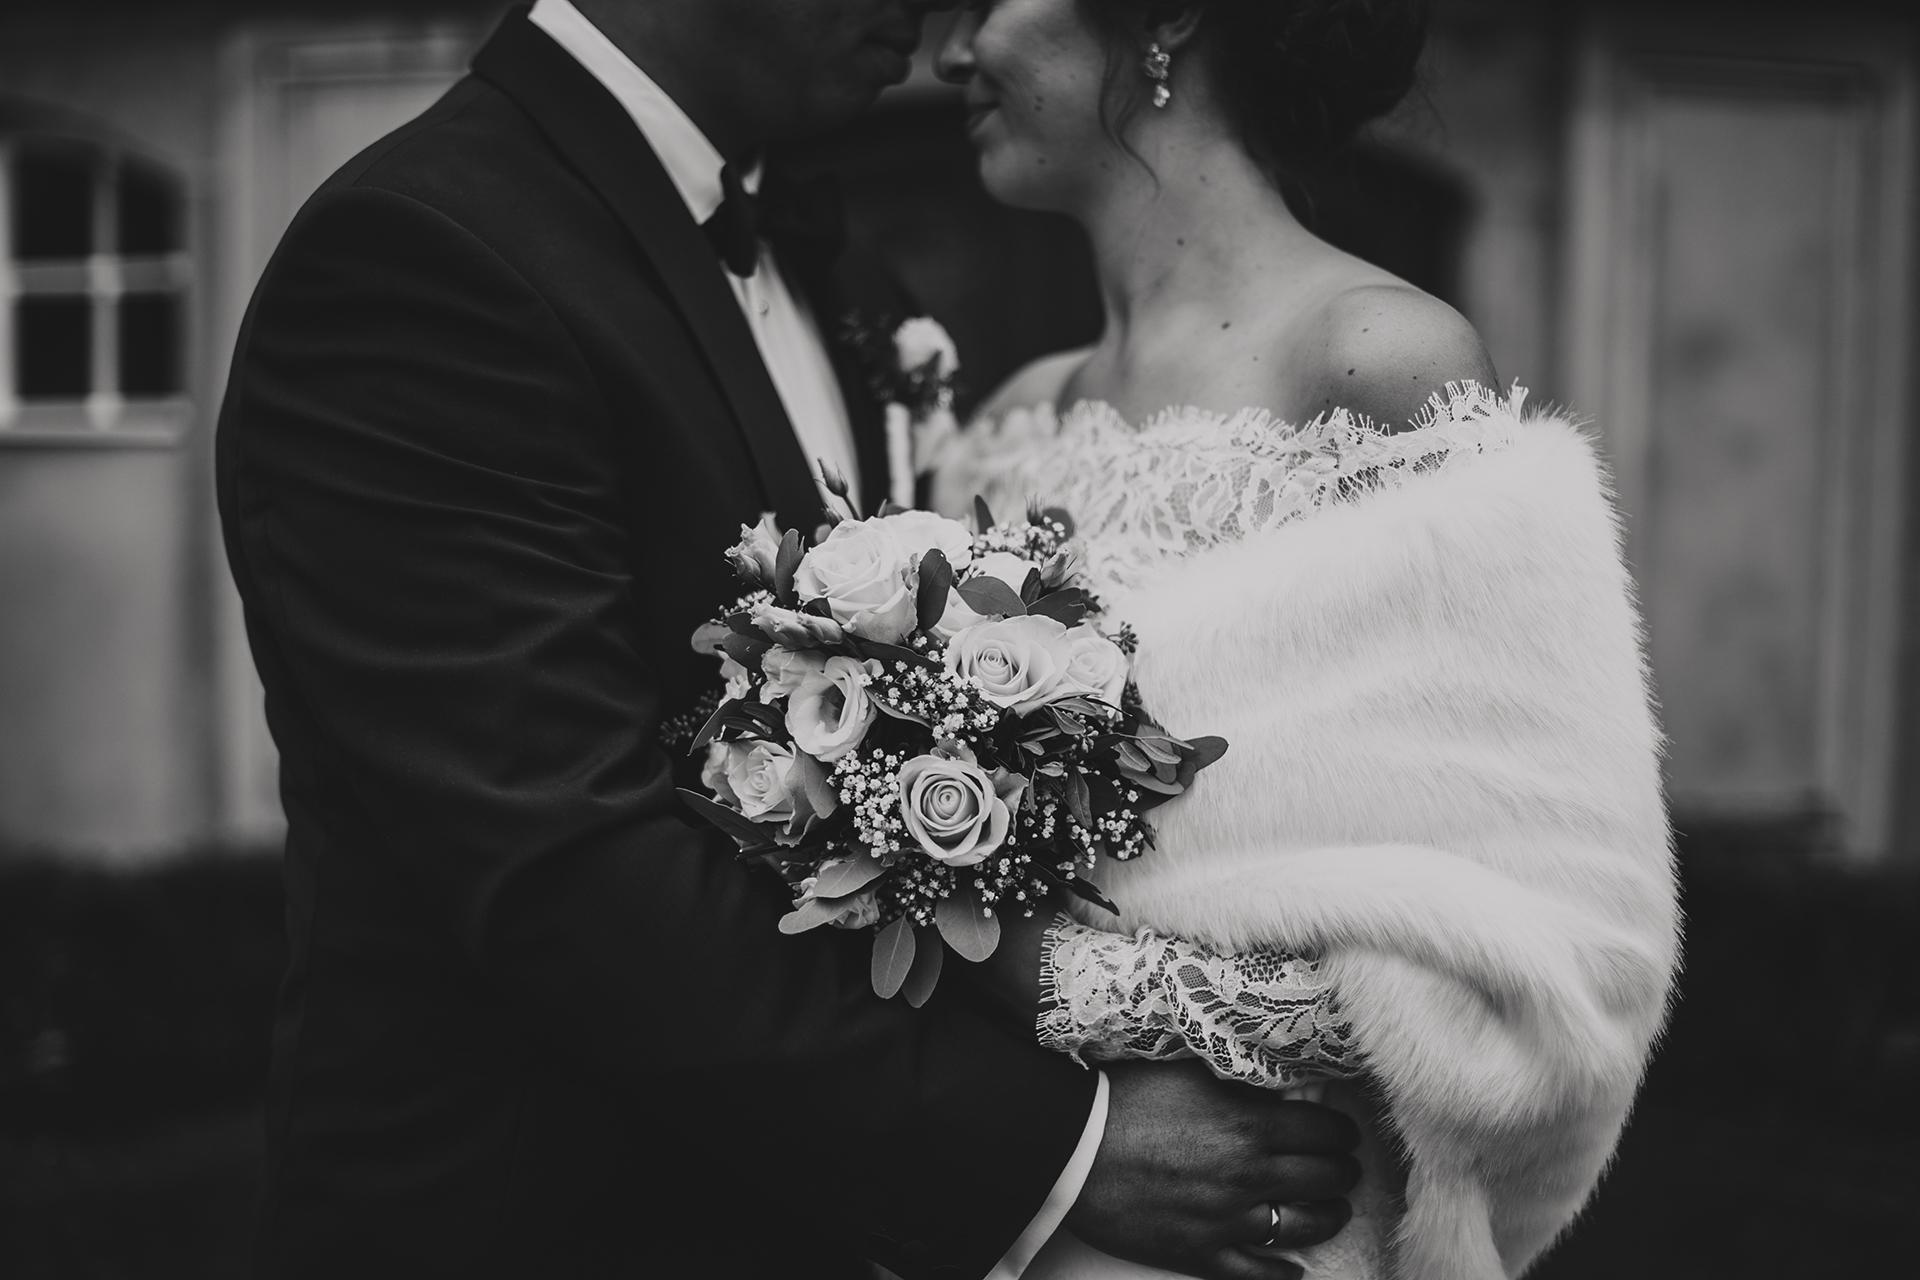 Hochzeitsreportage_J&D_063_Caroline Queda Fotografie